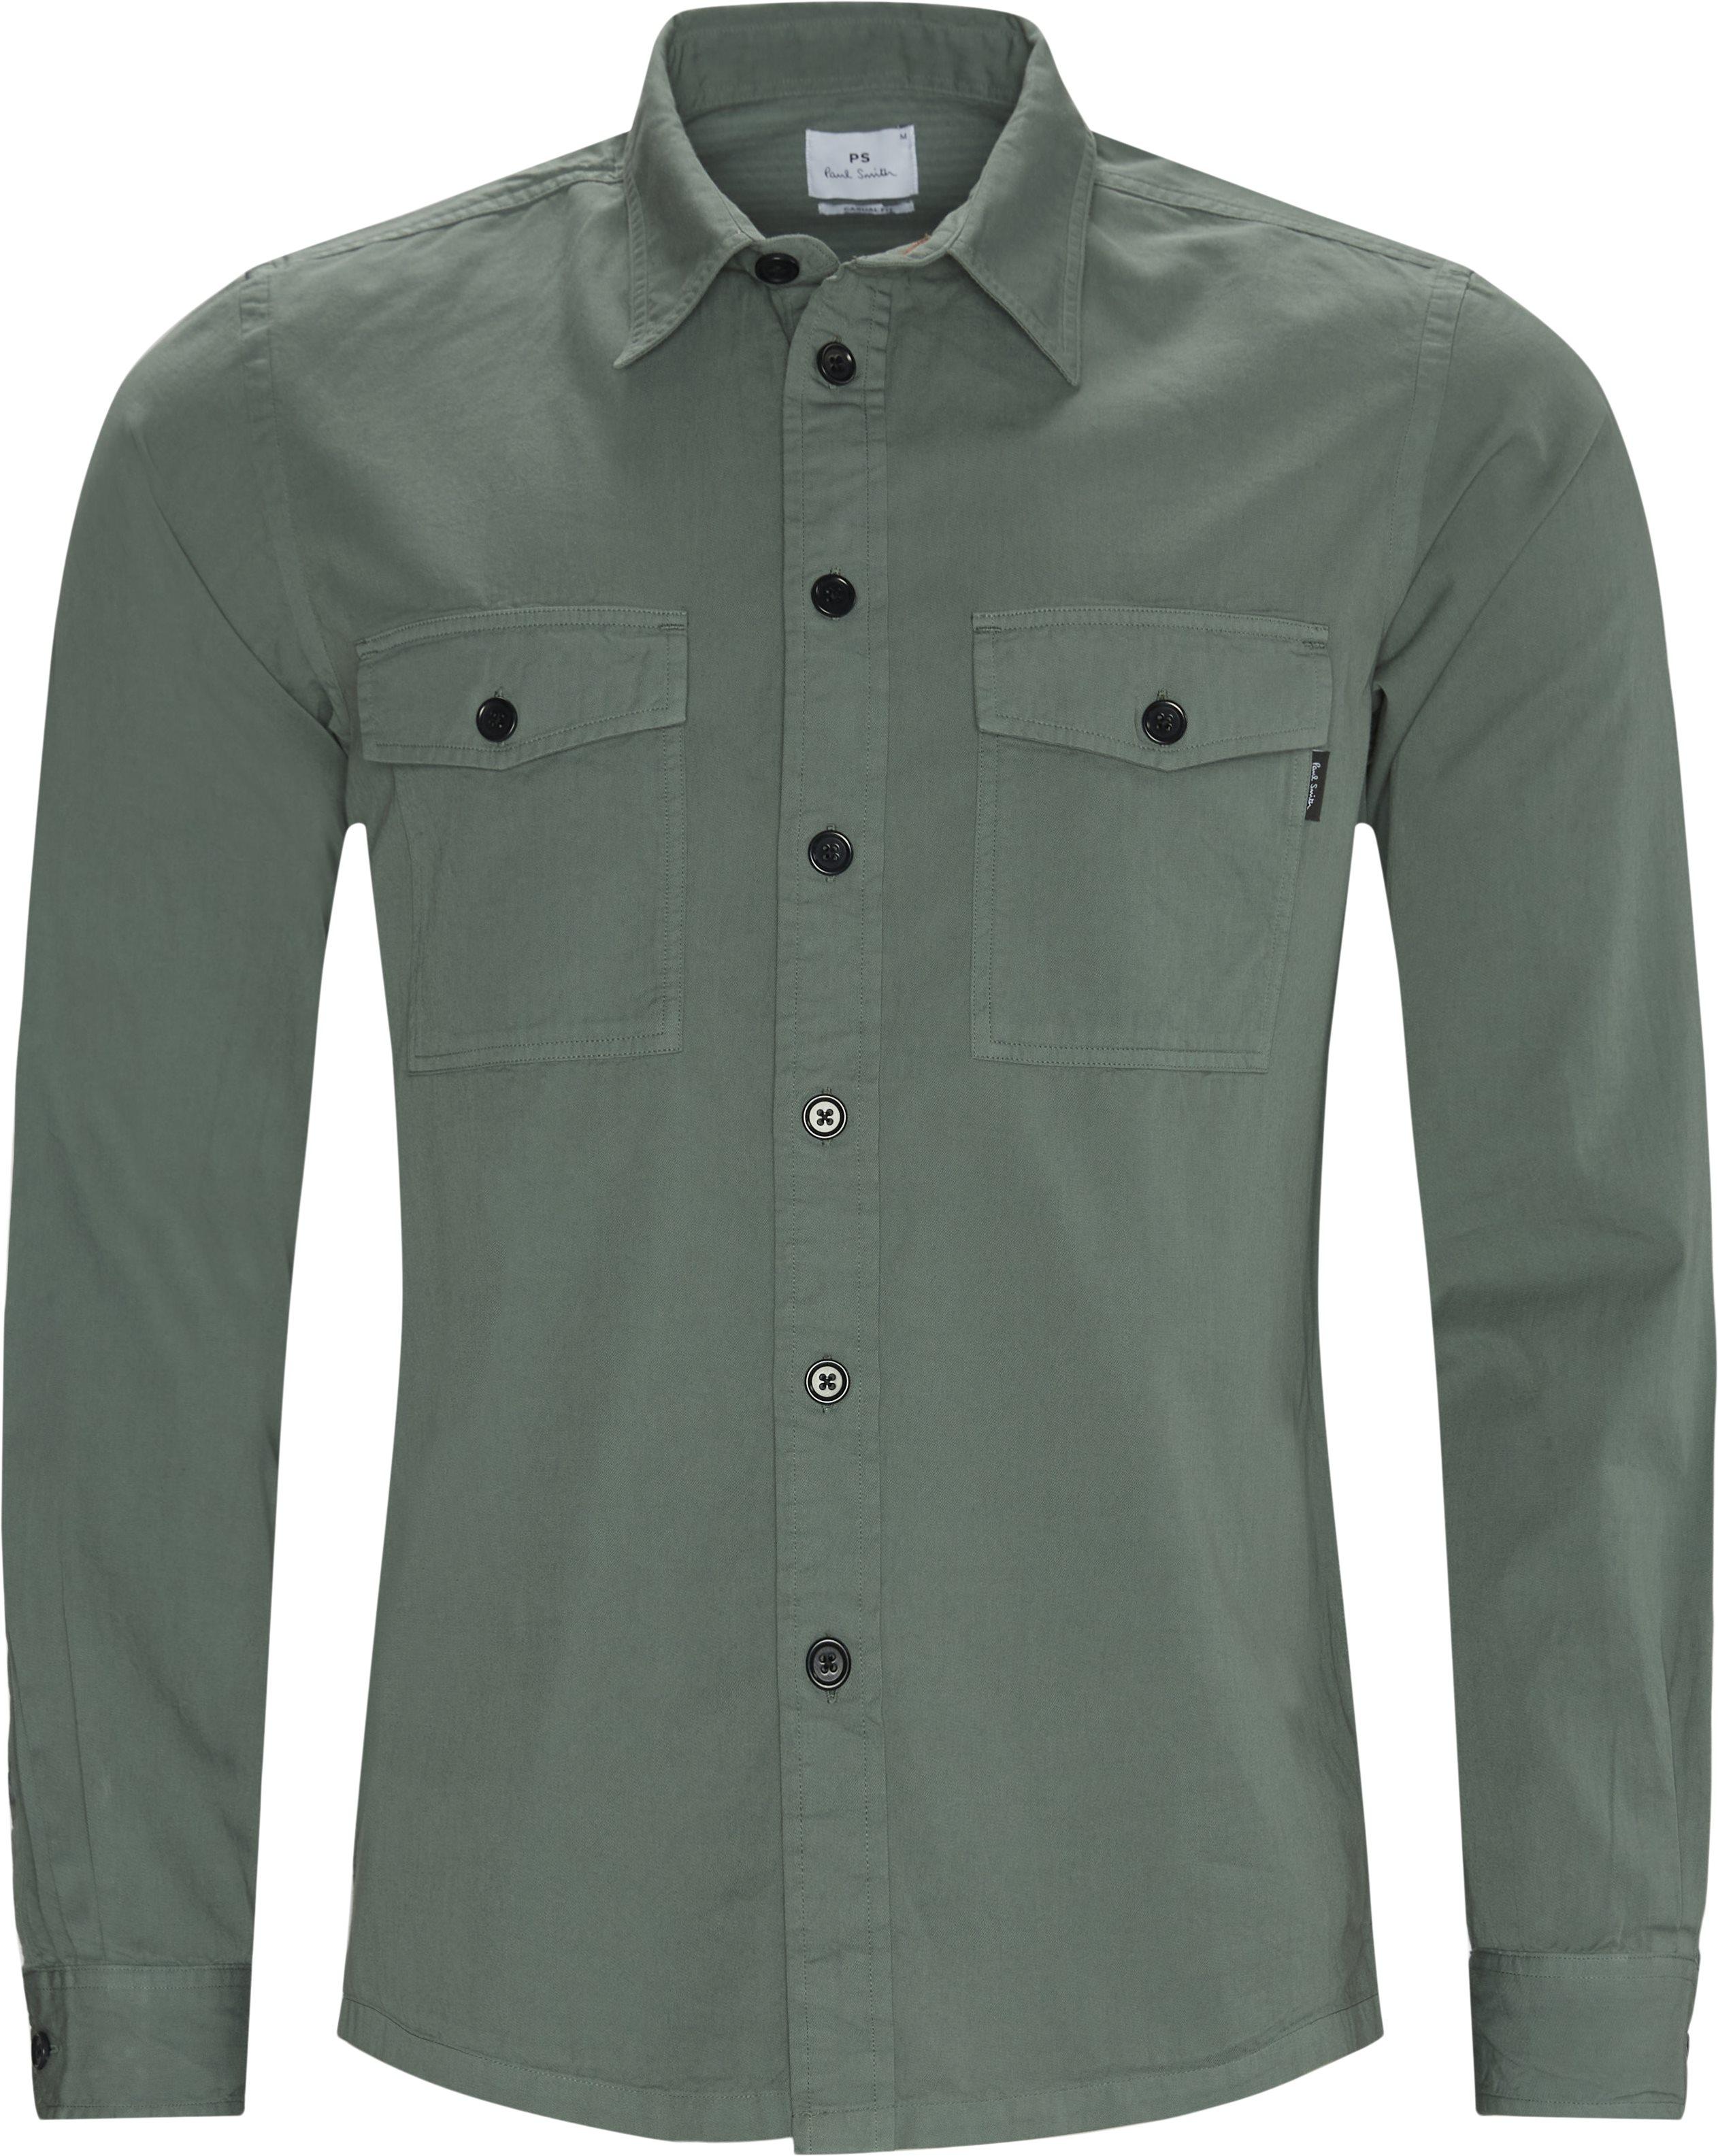 Skjorter - Regular fit - Army